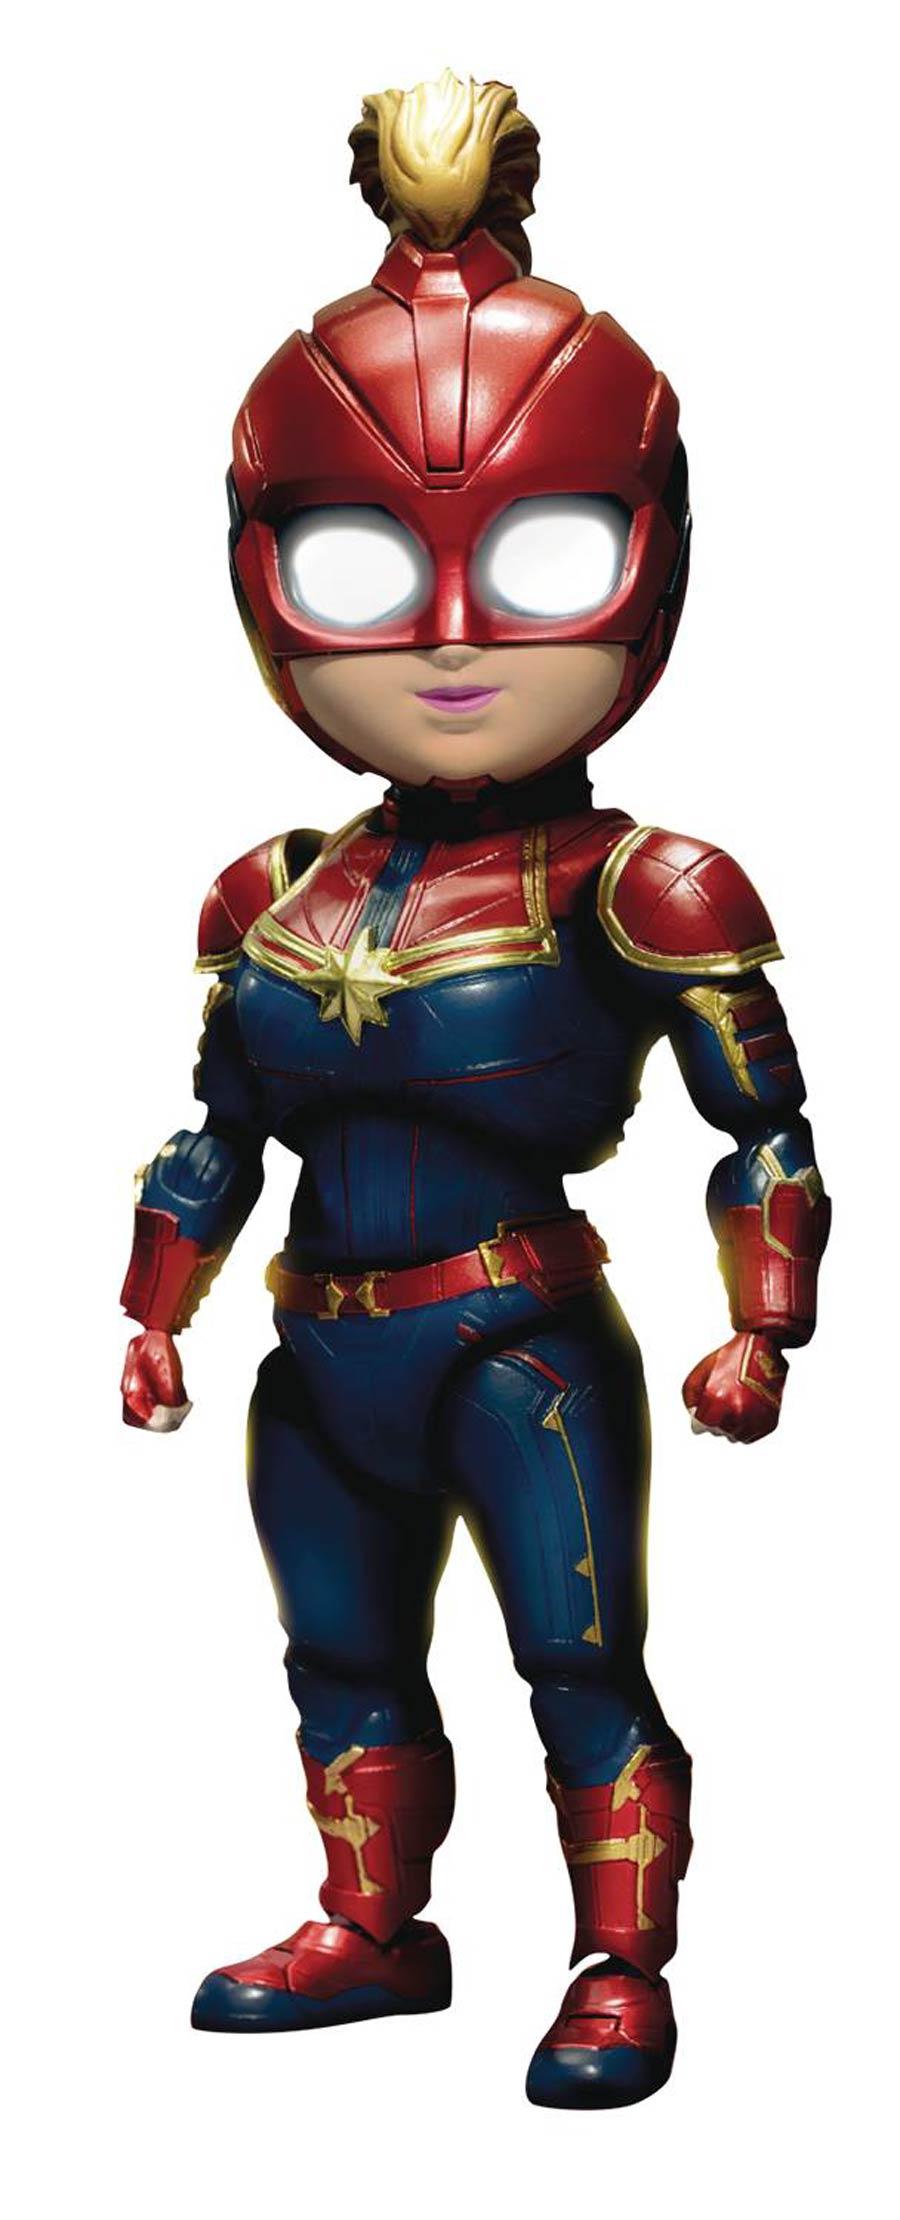 Captain Marvel EAA-075 Carol Danvers Previews Exclusive Action Figure